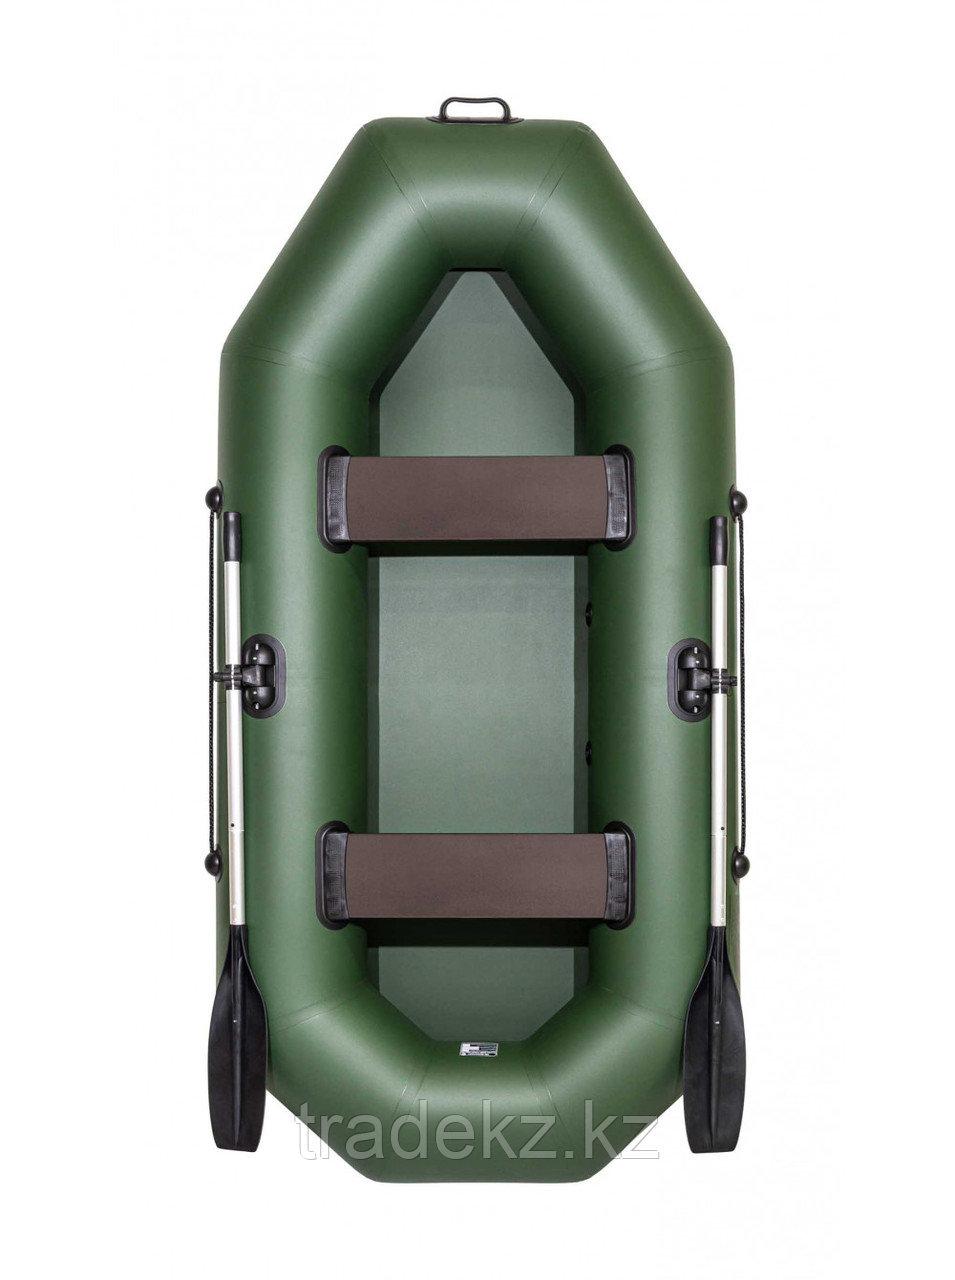 Лодка ПВХ Барс 260 зеленый